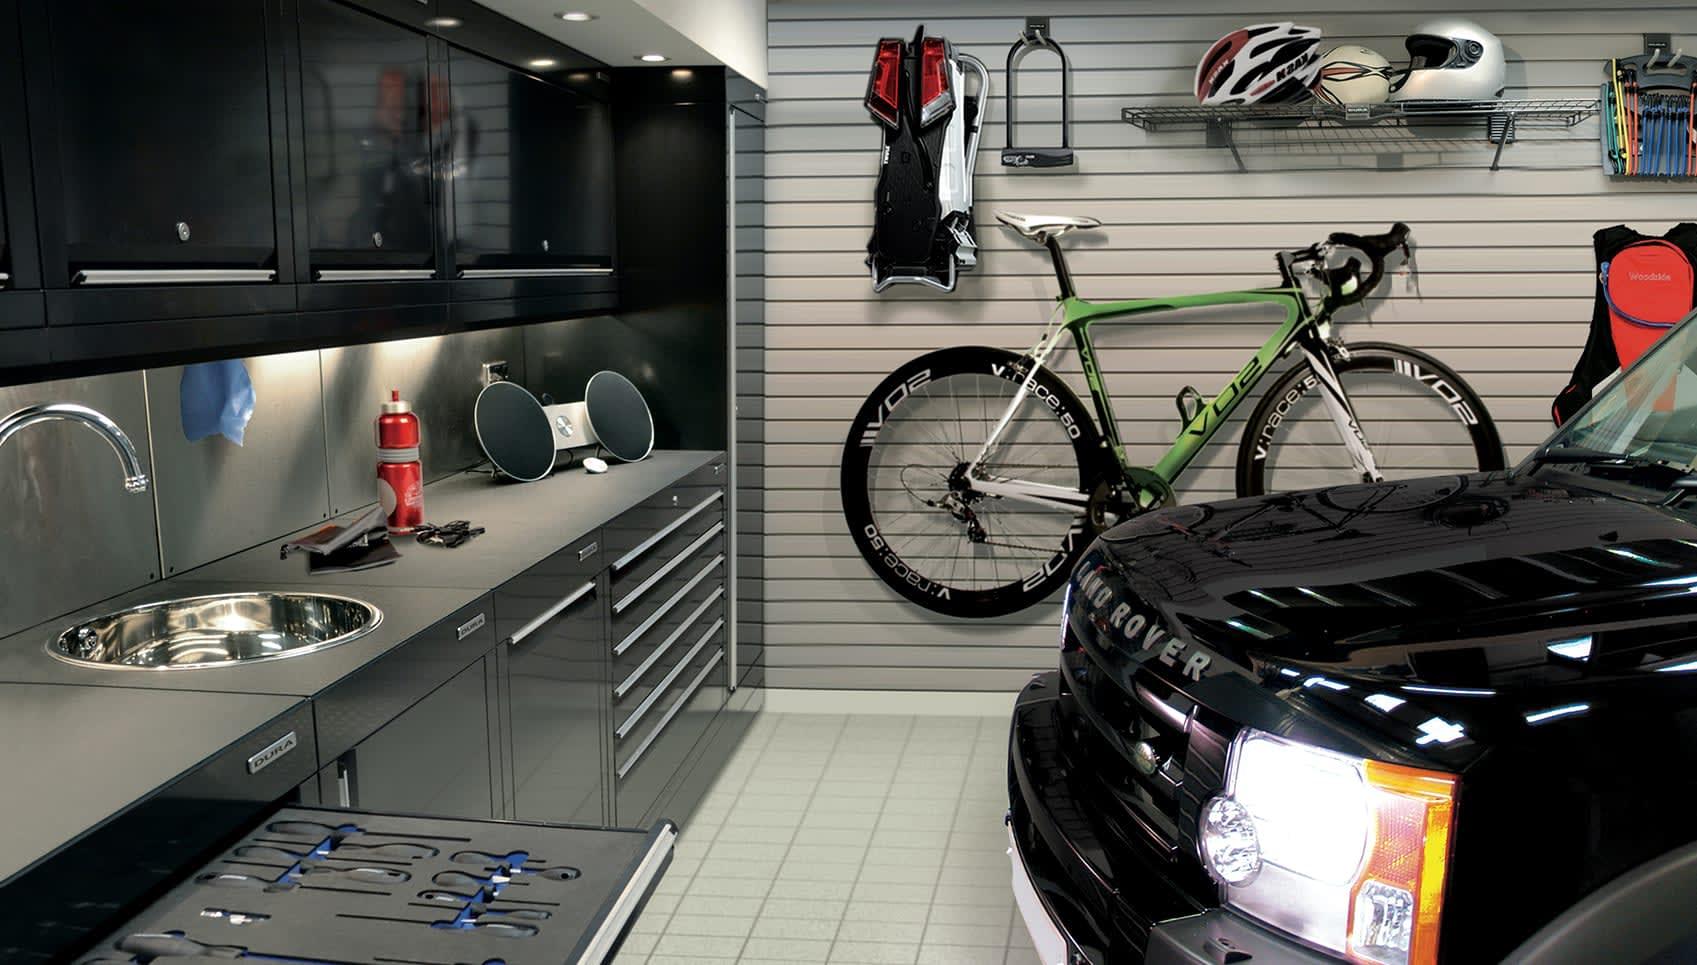 Family Garage Amp Home Storage Solution From Dura Garages